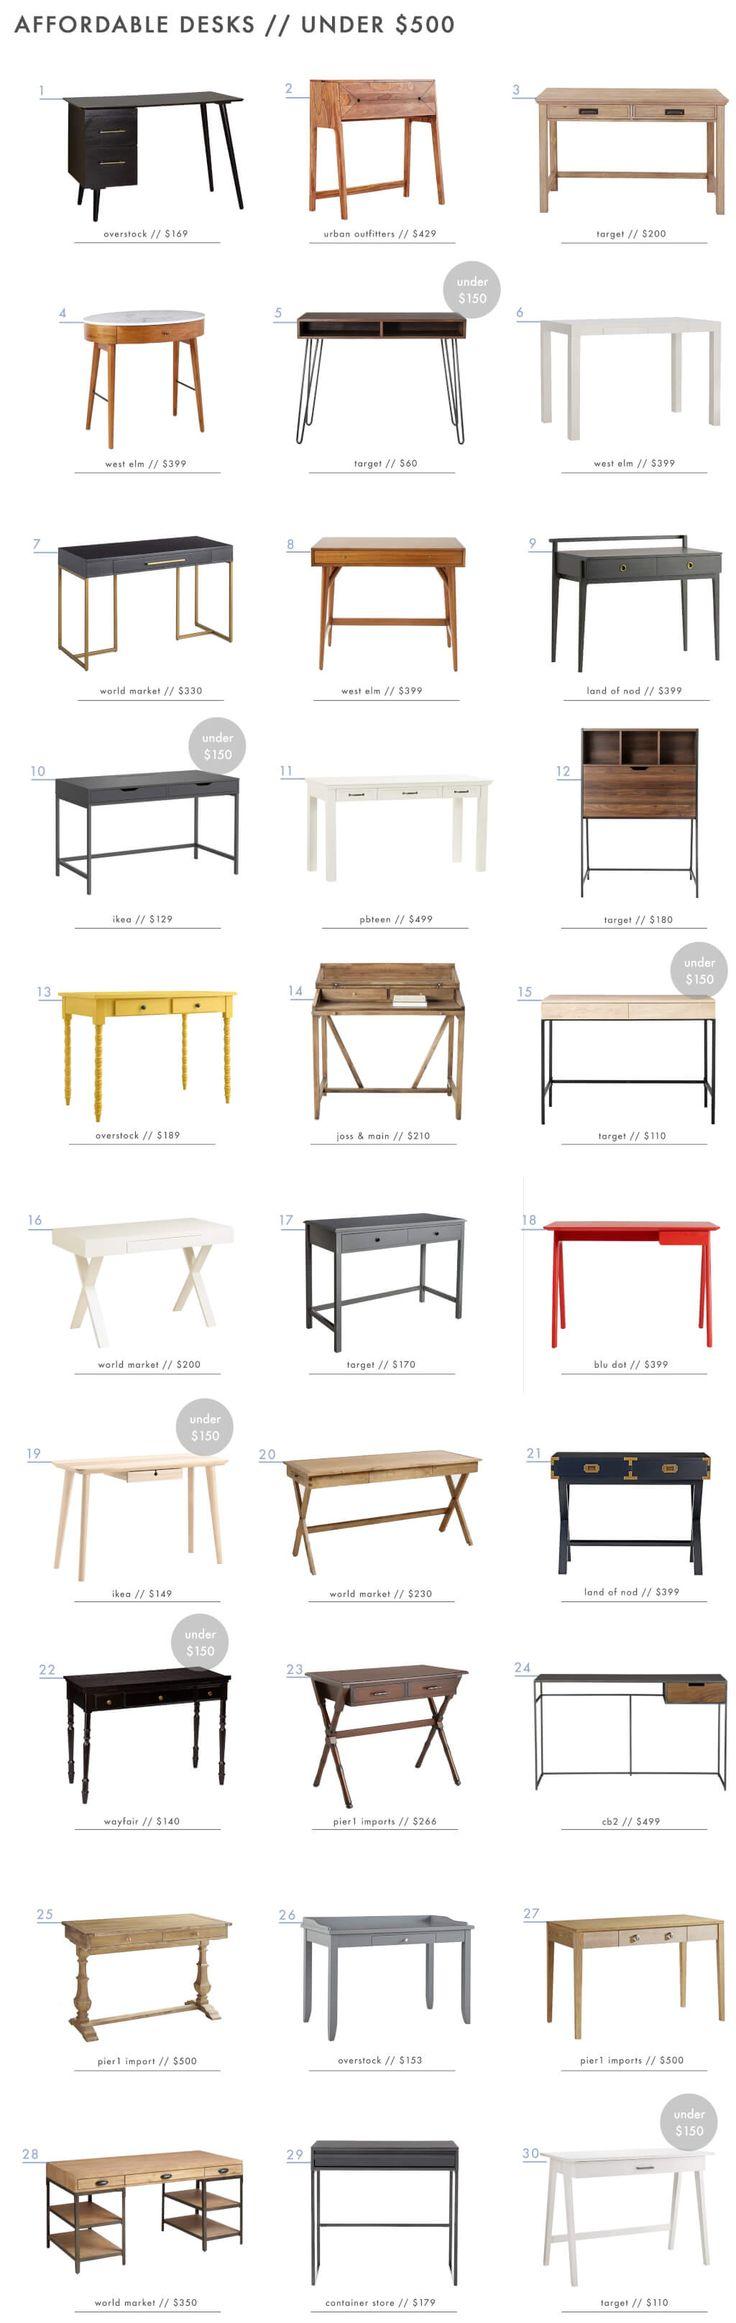 Emily Henderson Back to School Affordable Desks Under 500 Roundup